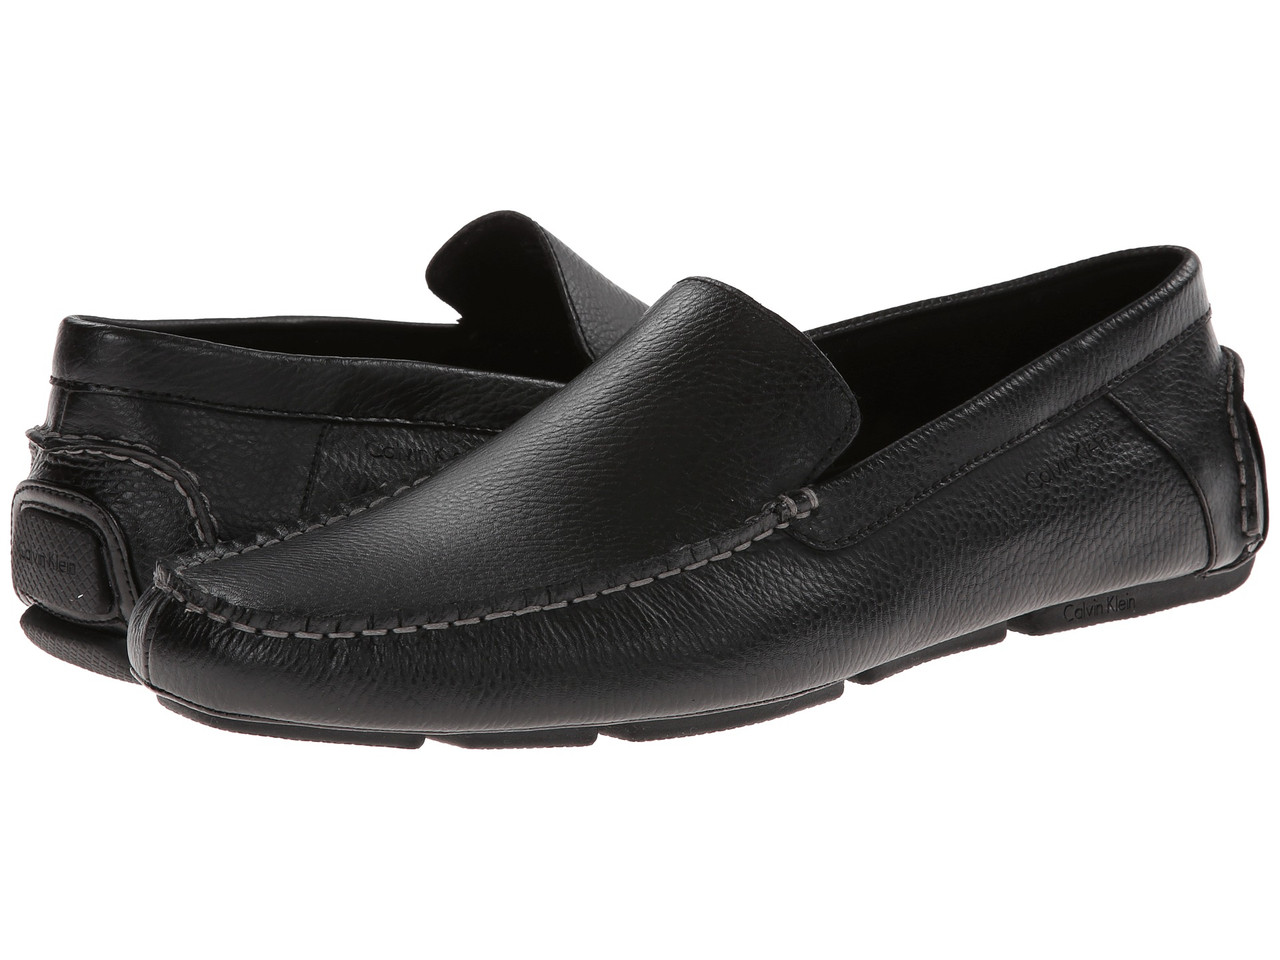 99cc8984d Мокасины мужские лоферы черные Calvin Klein , цена 2 890 грн ...